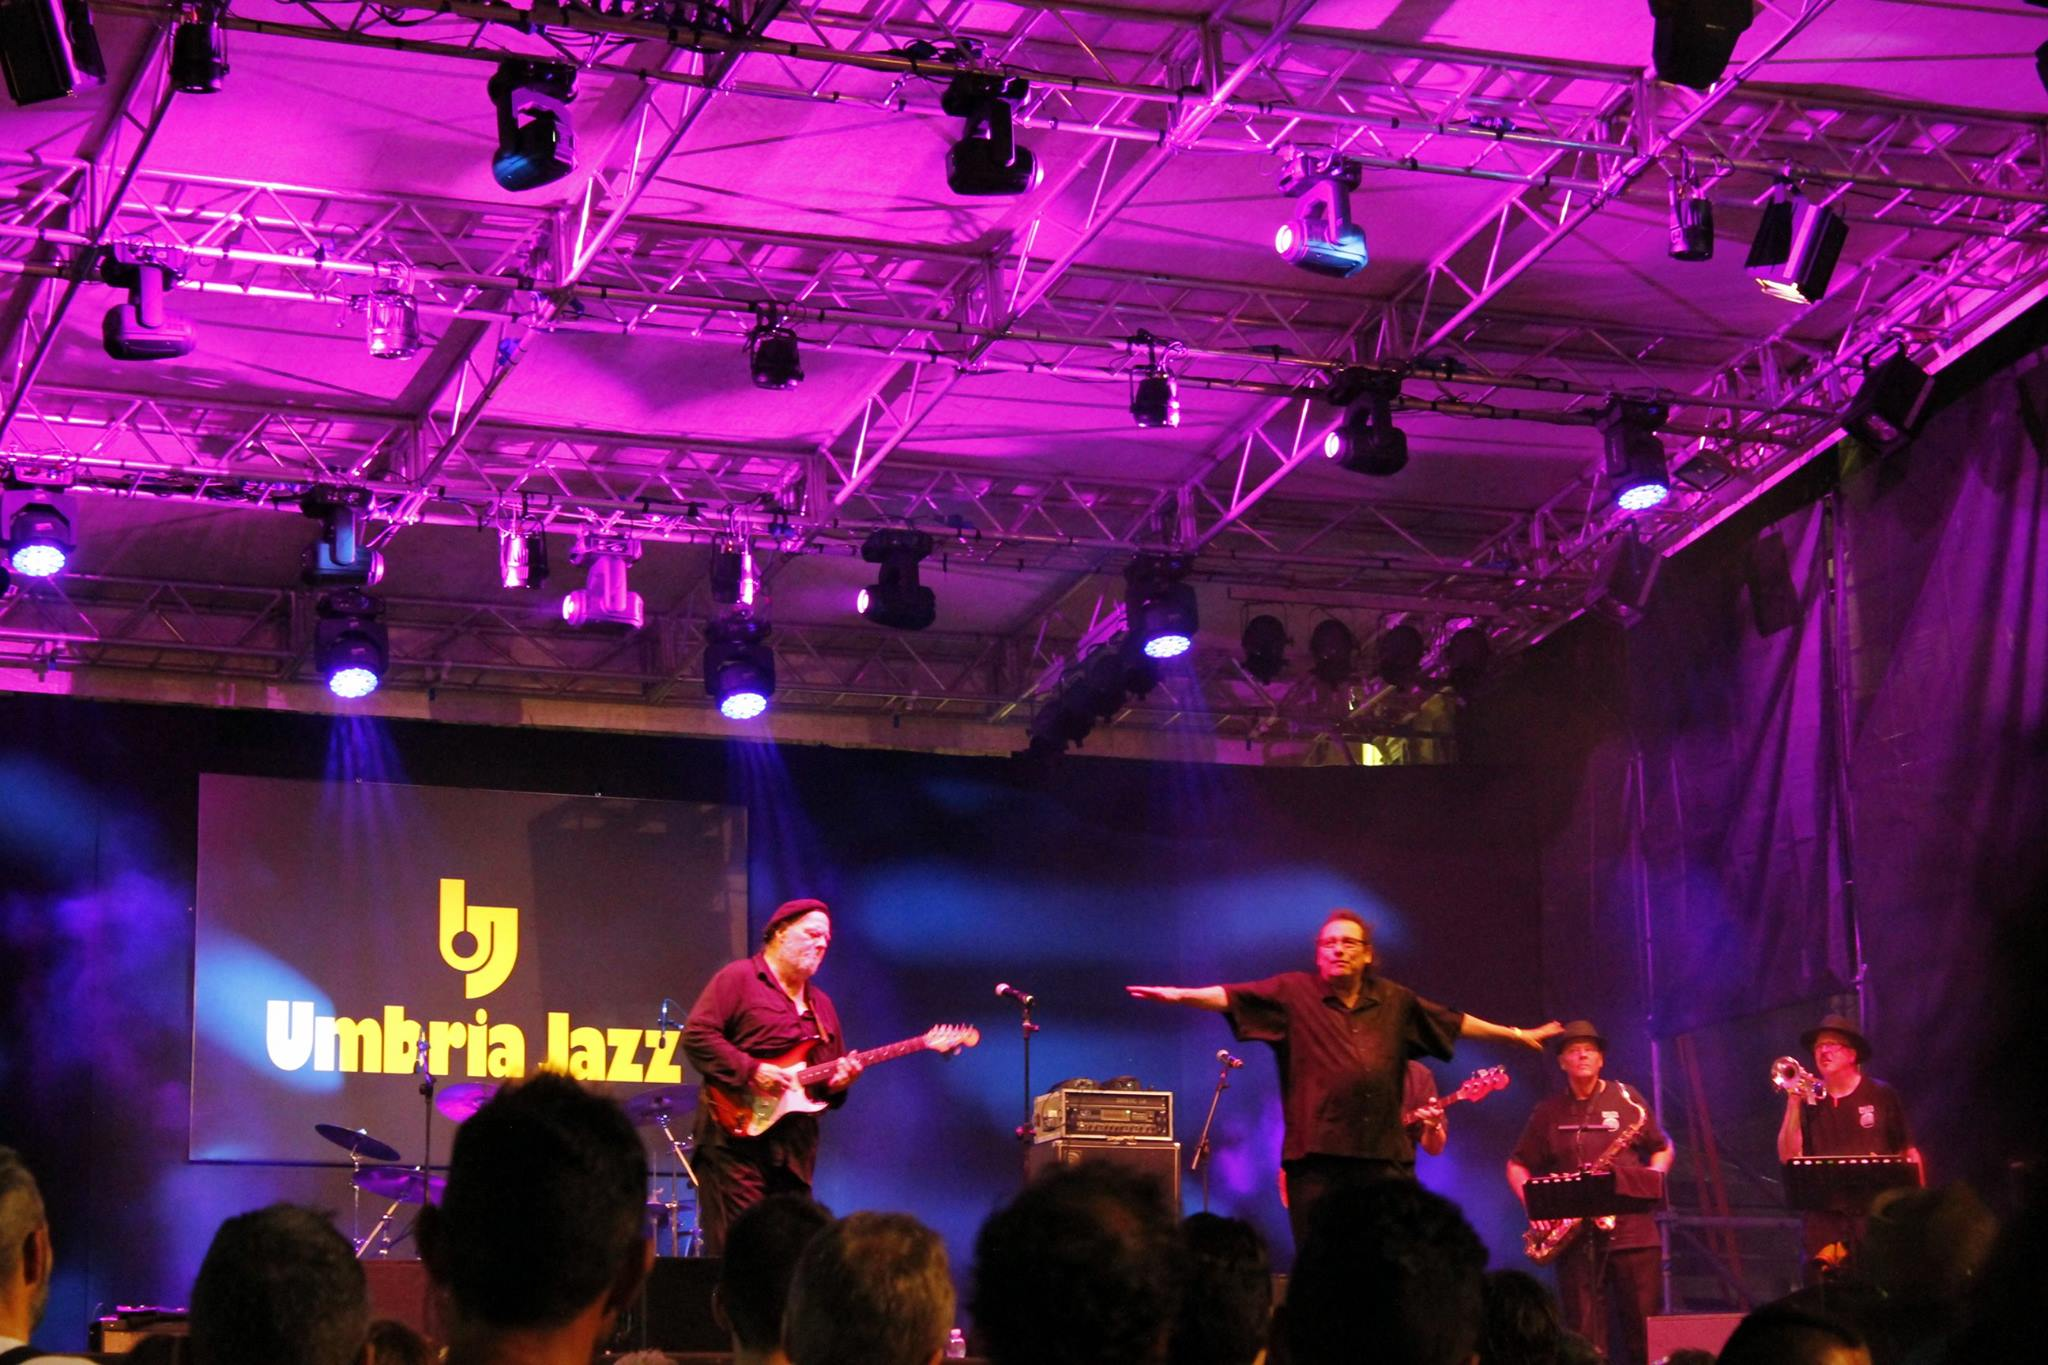 Artisti sul palco di Umbria Jazz